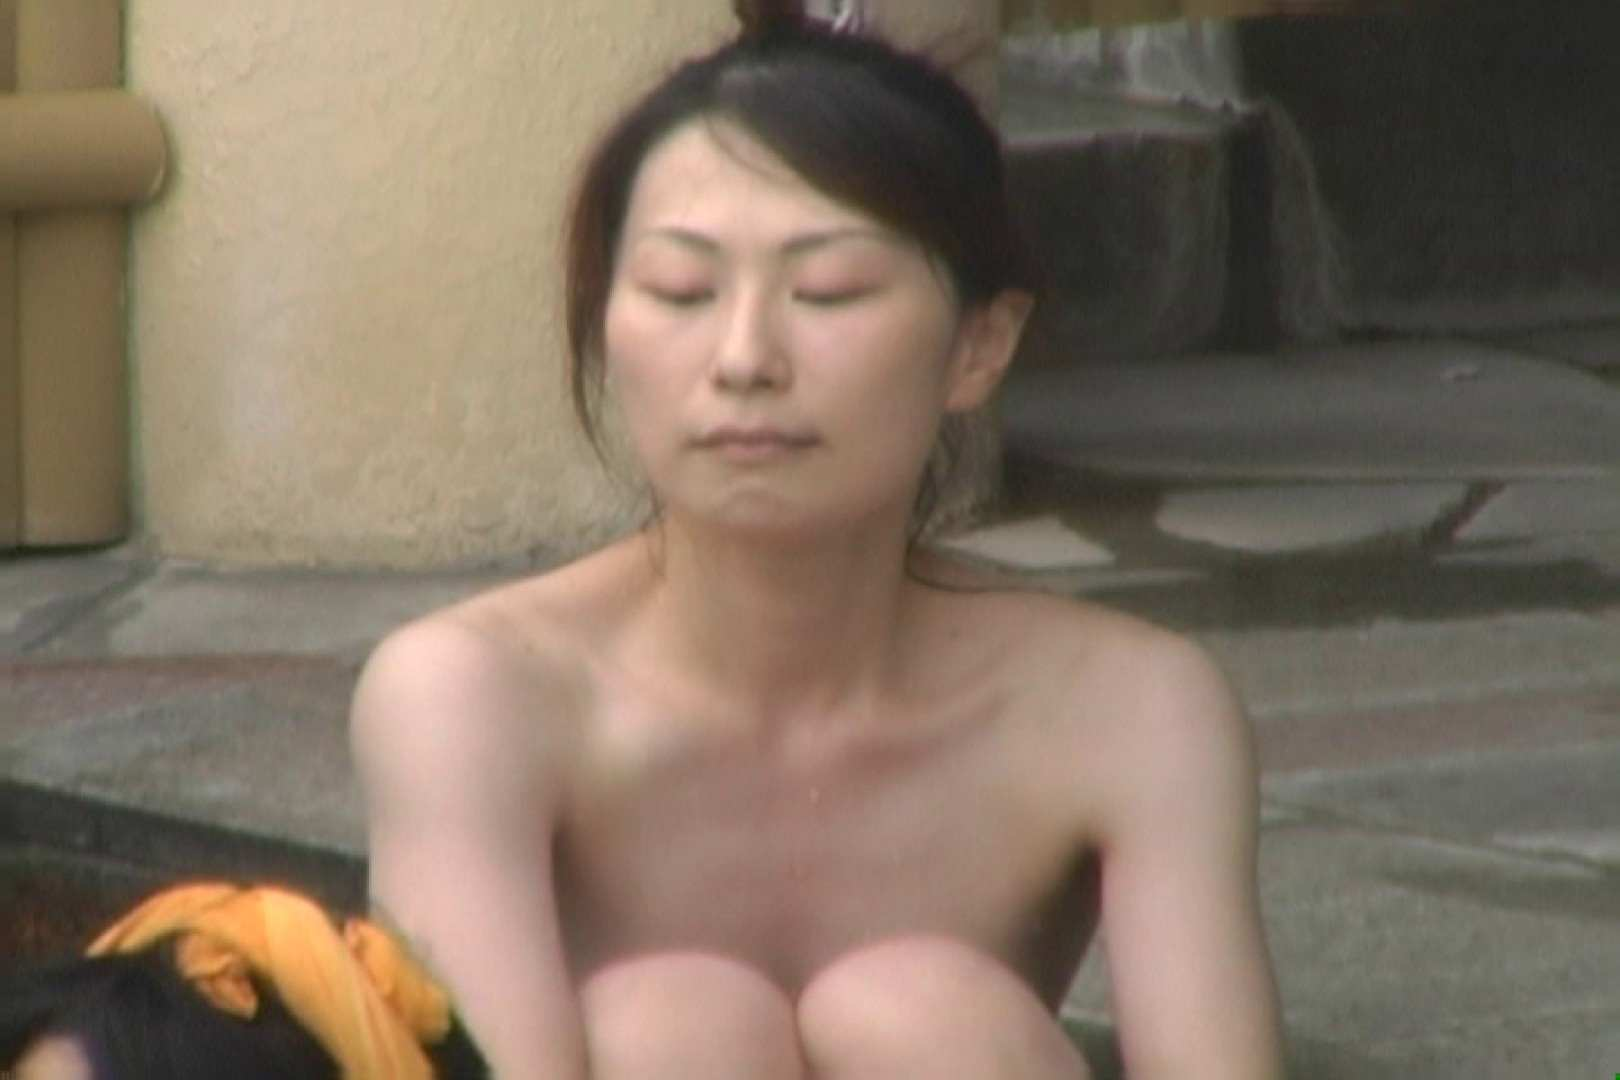 Aquaな露天風呂Vol.615 0   0  36連発 7